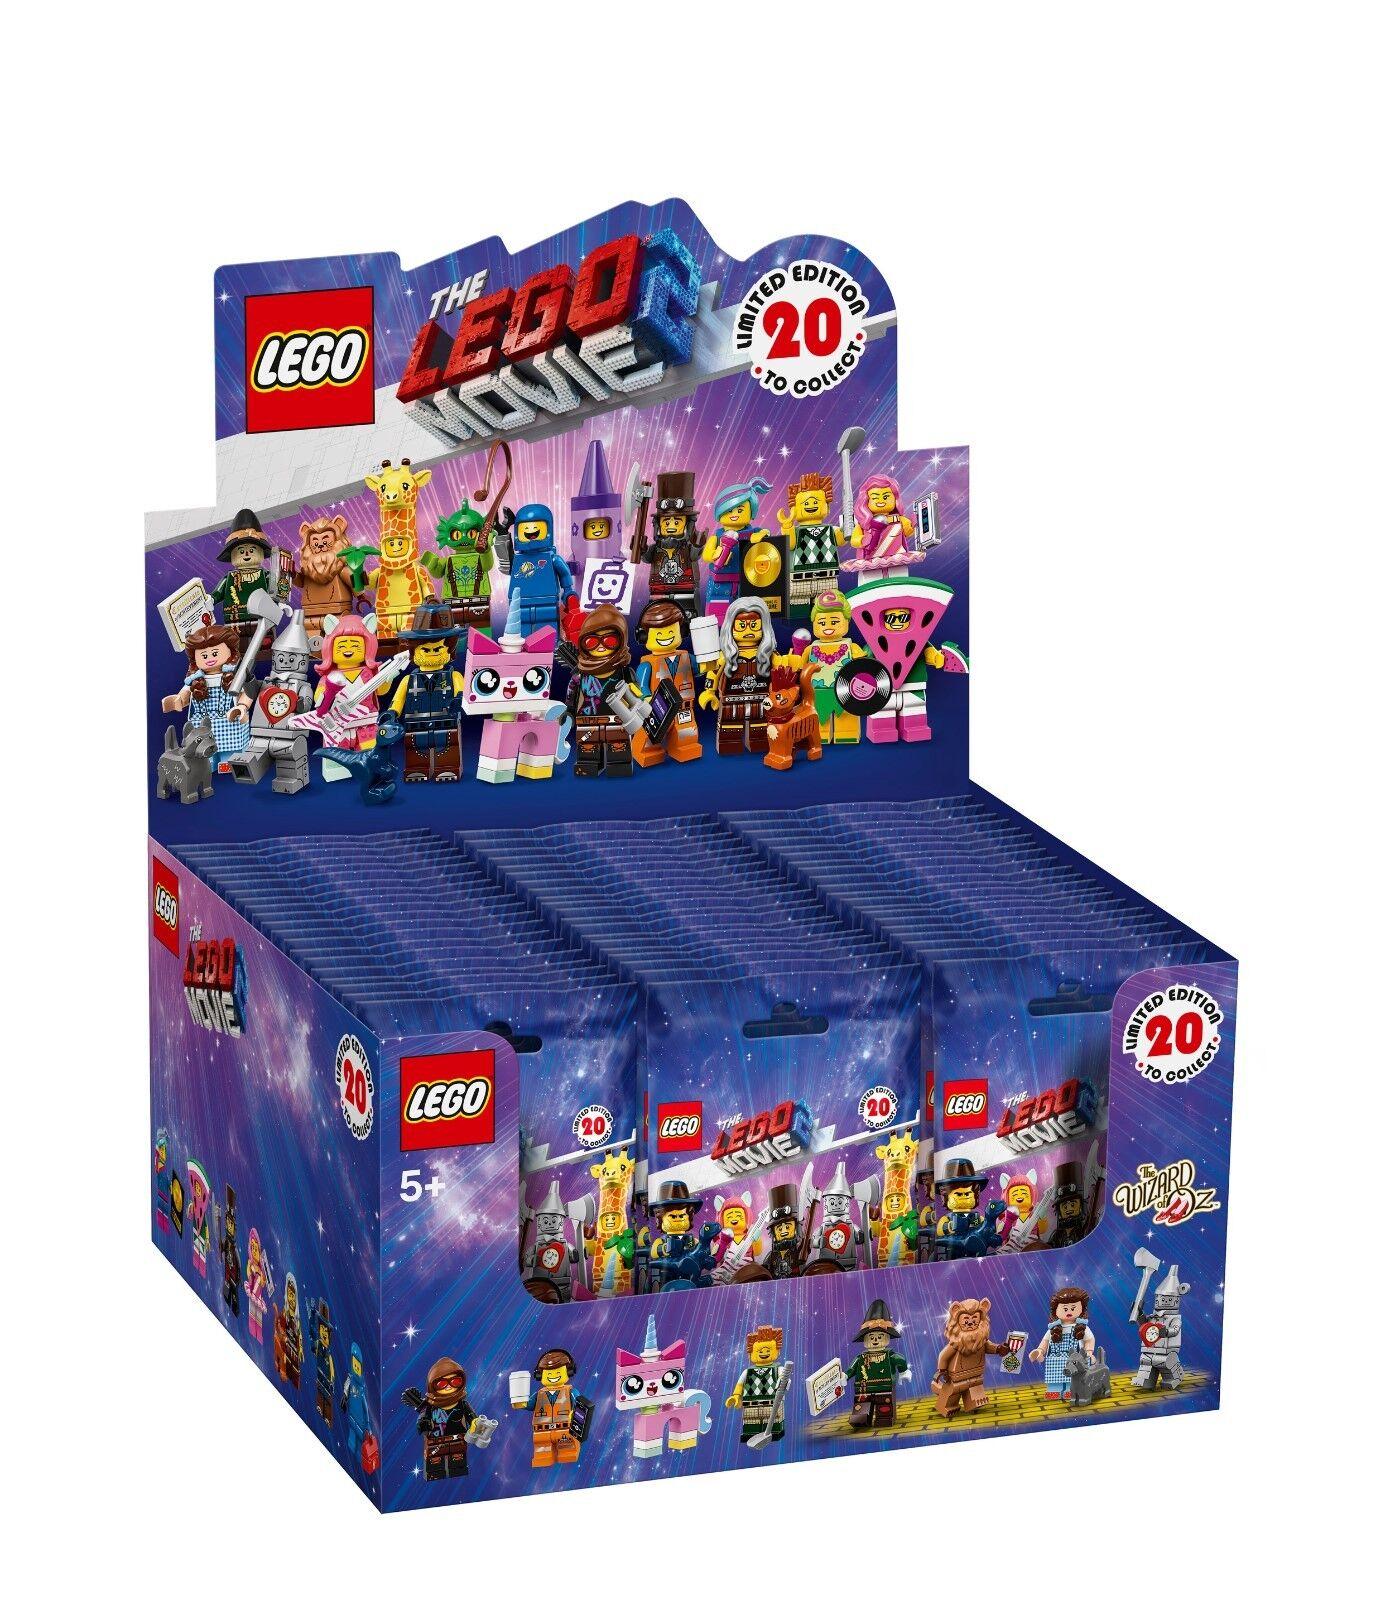 LEGO ® Minifigures 71023 The Lego Movie ™ 2 comptoirs Display (á 60 pochettes)